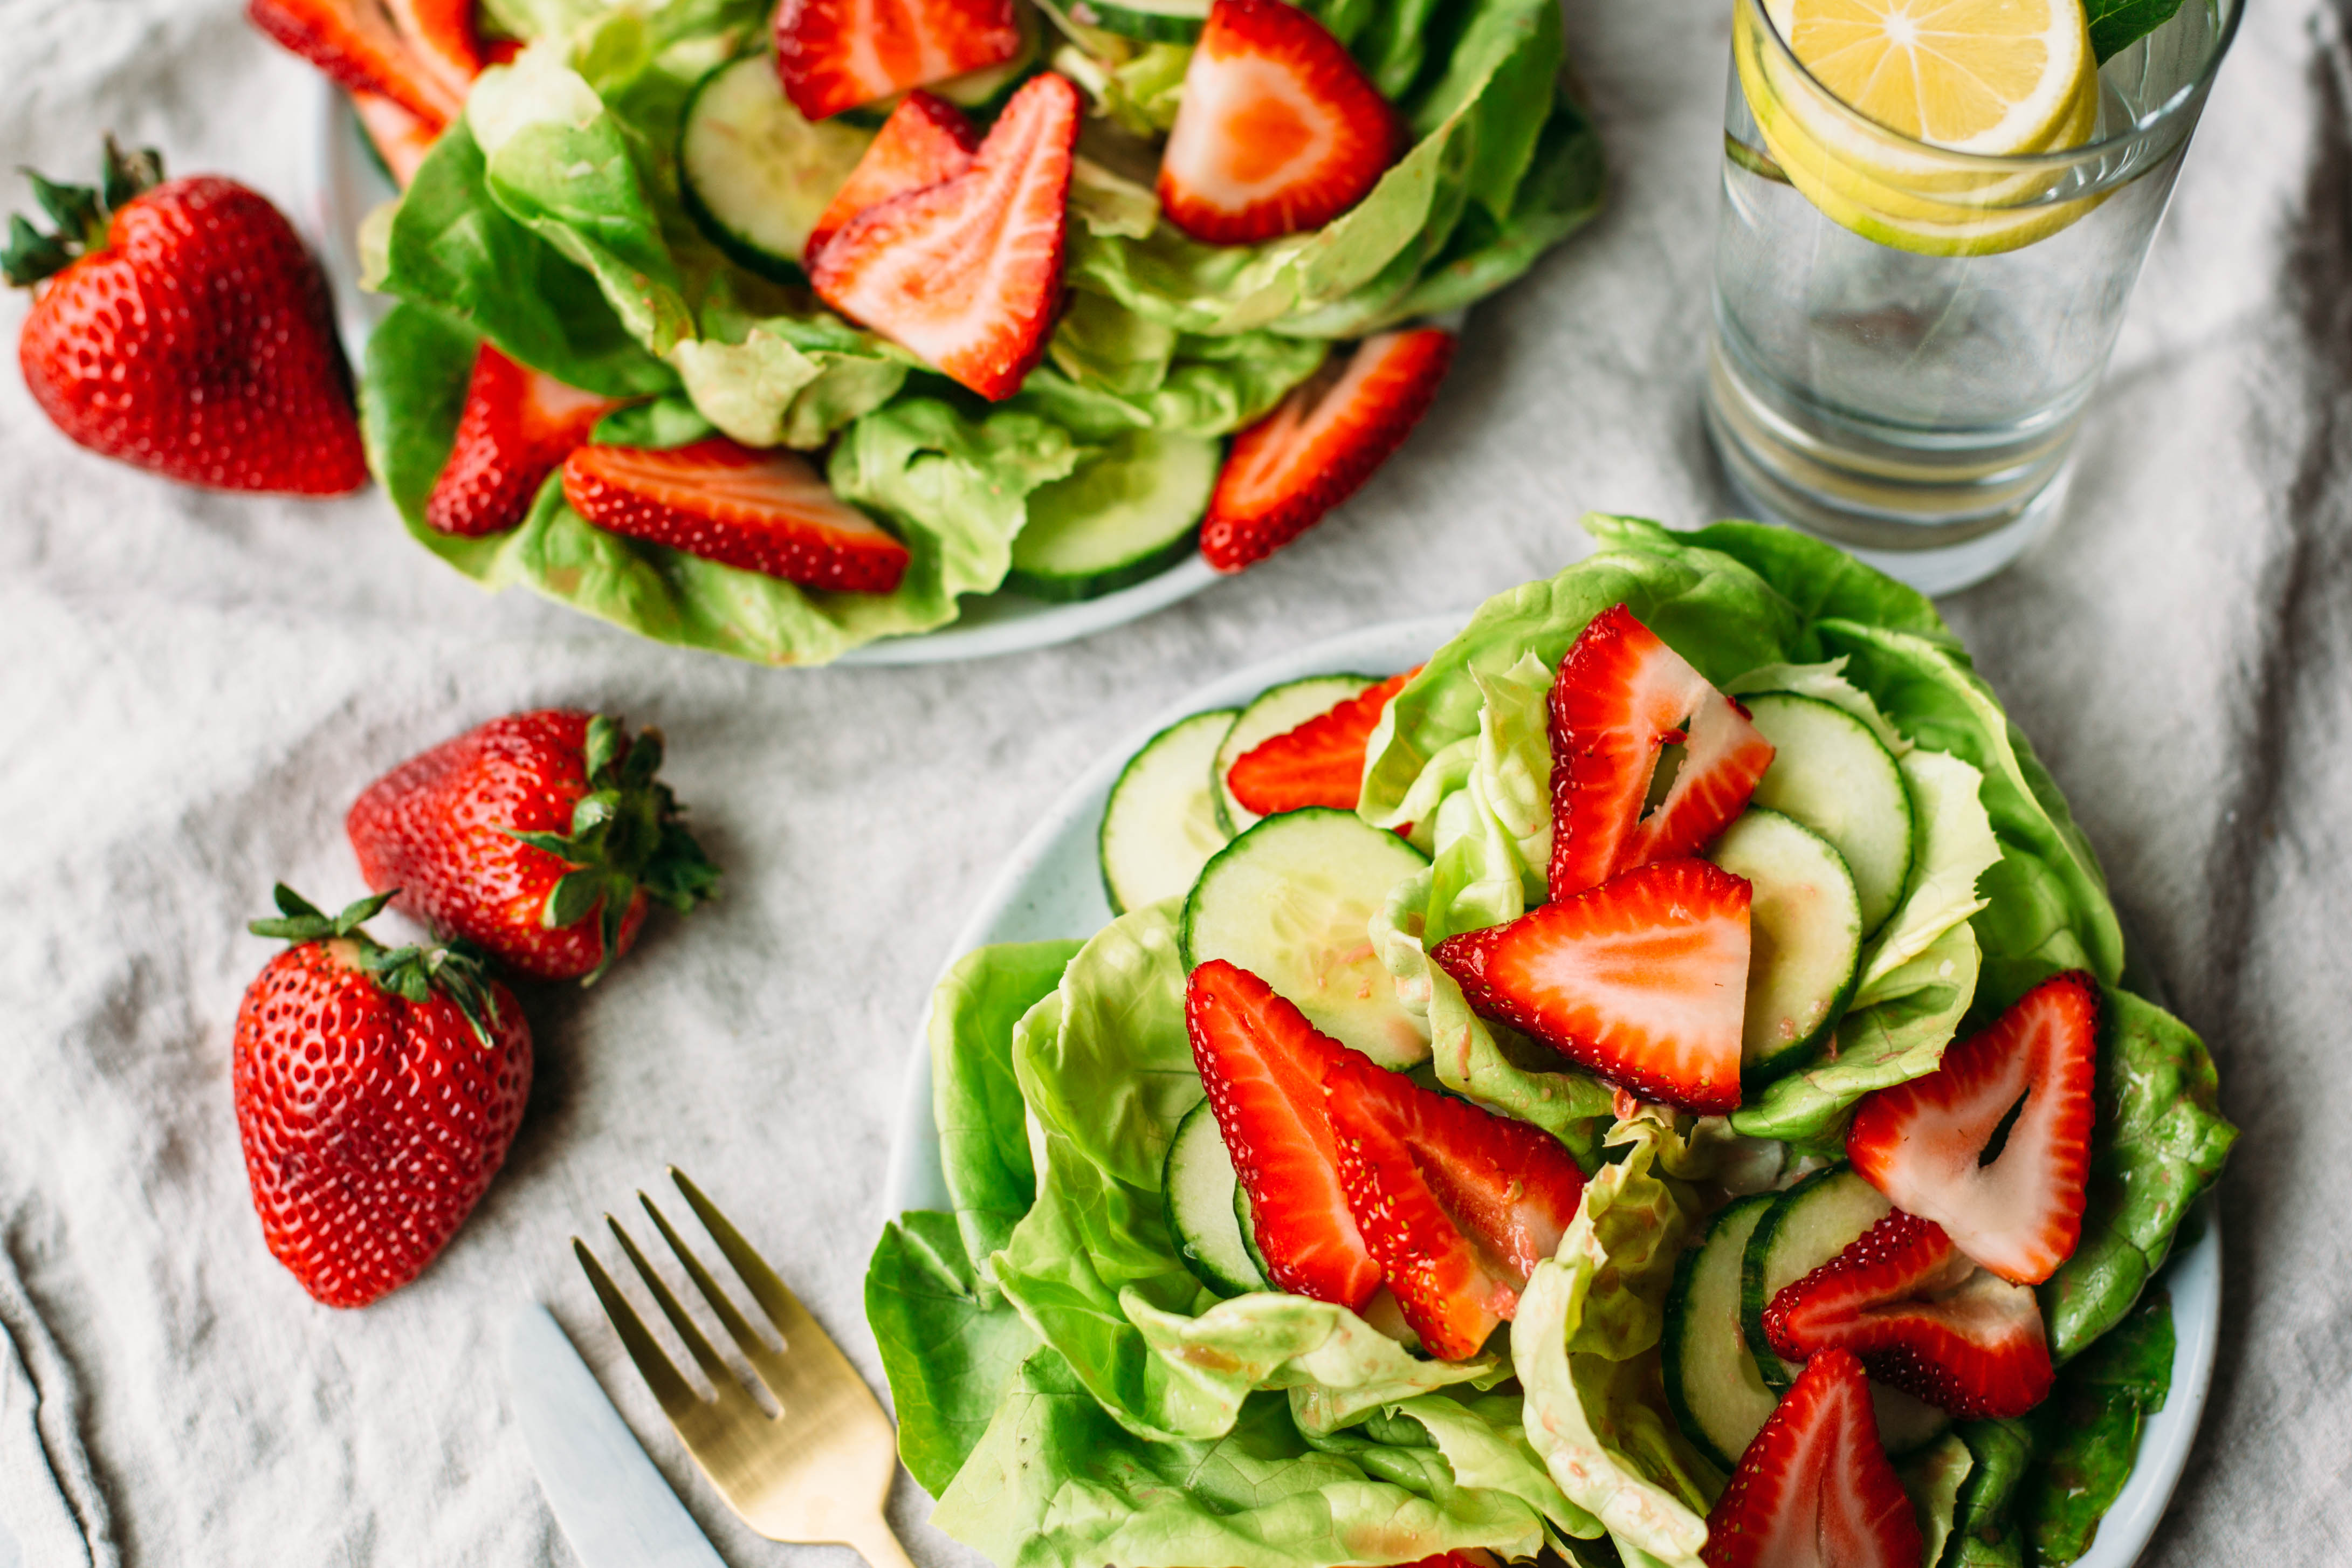 Strawberry Vinaigrette + Simple Salad